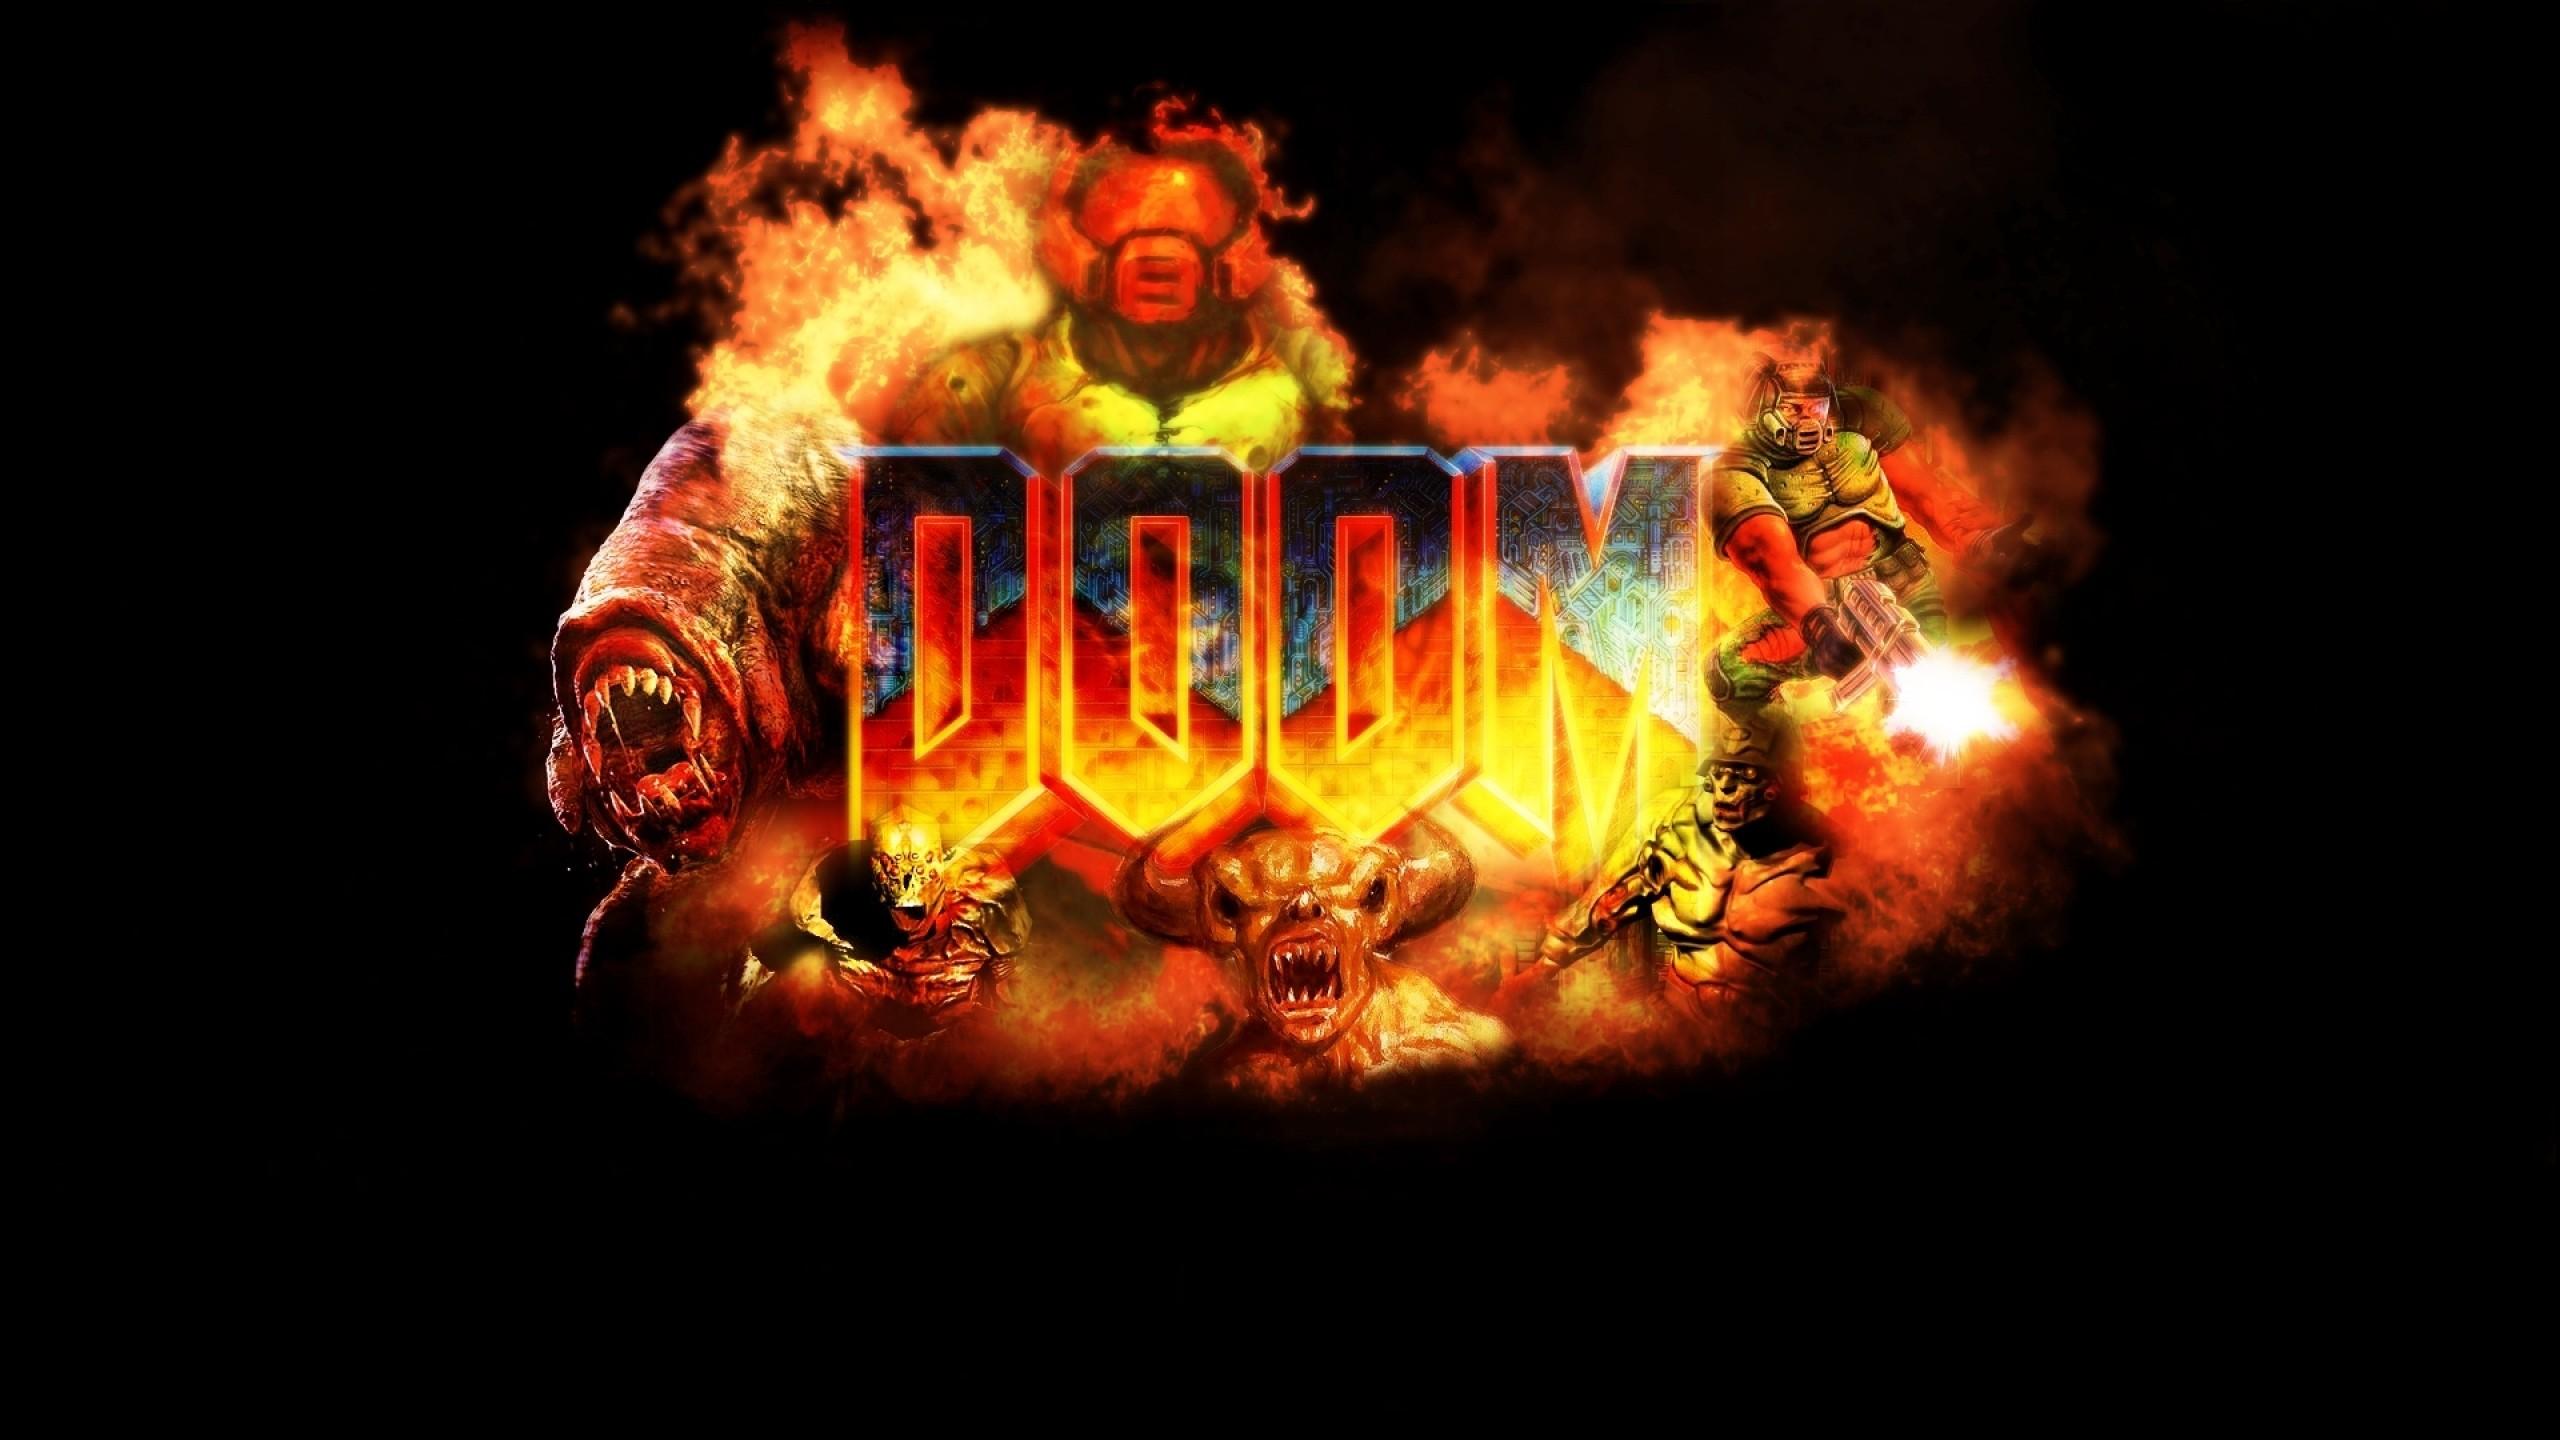 Wallpaper doom, game, logo, explosion, fire